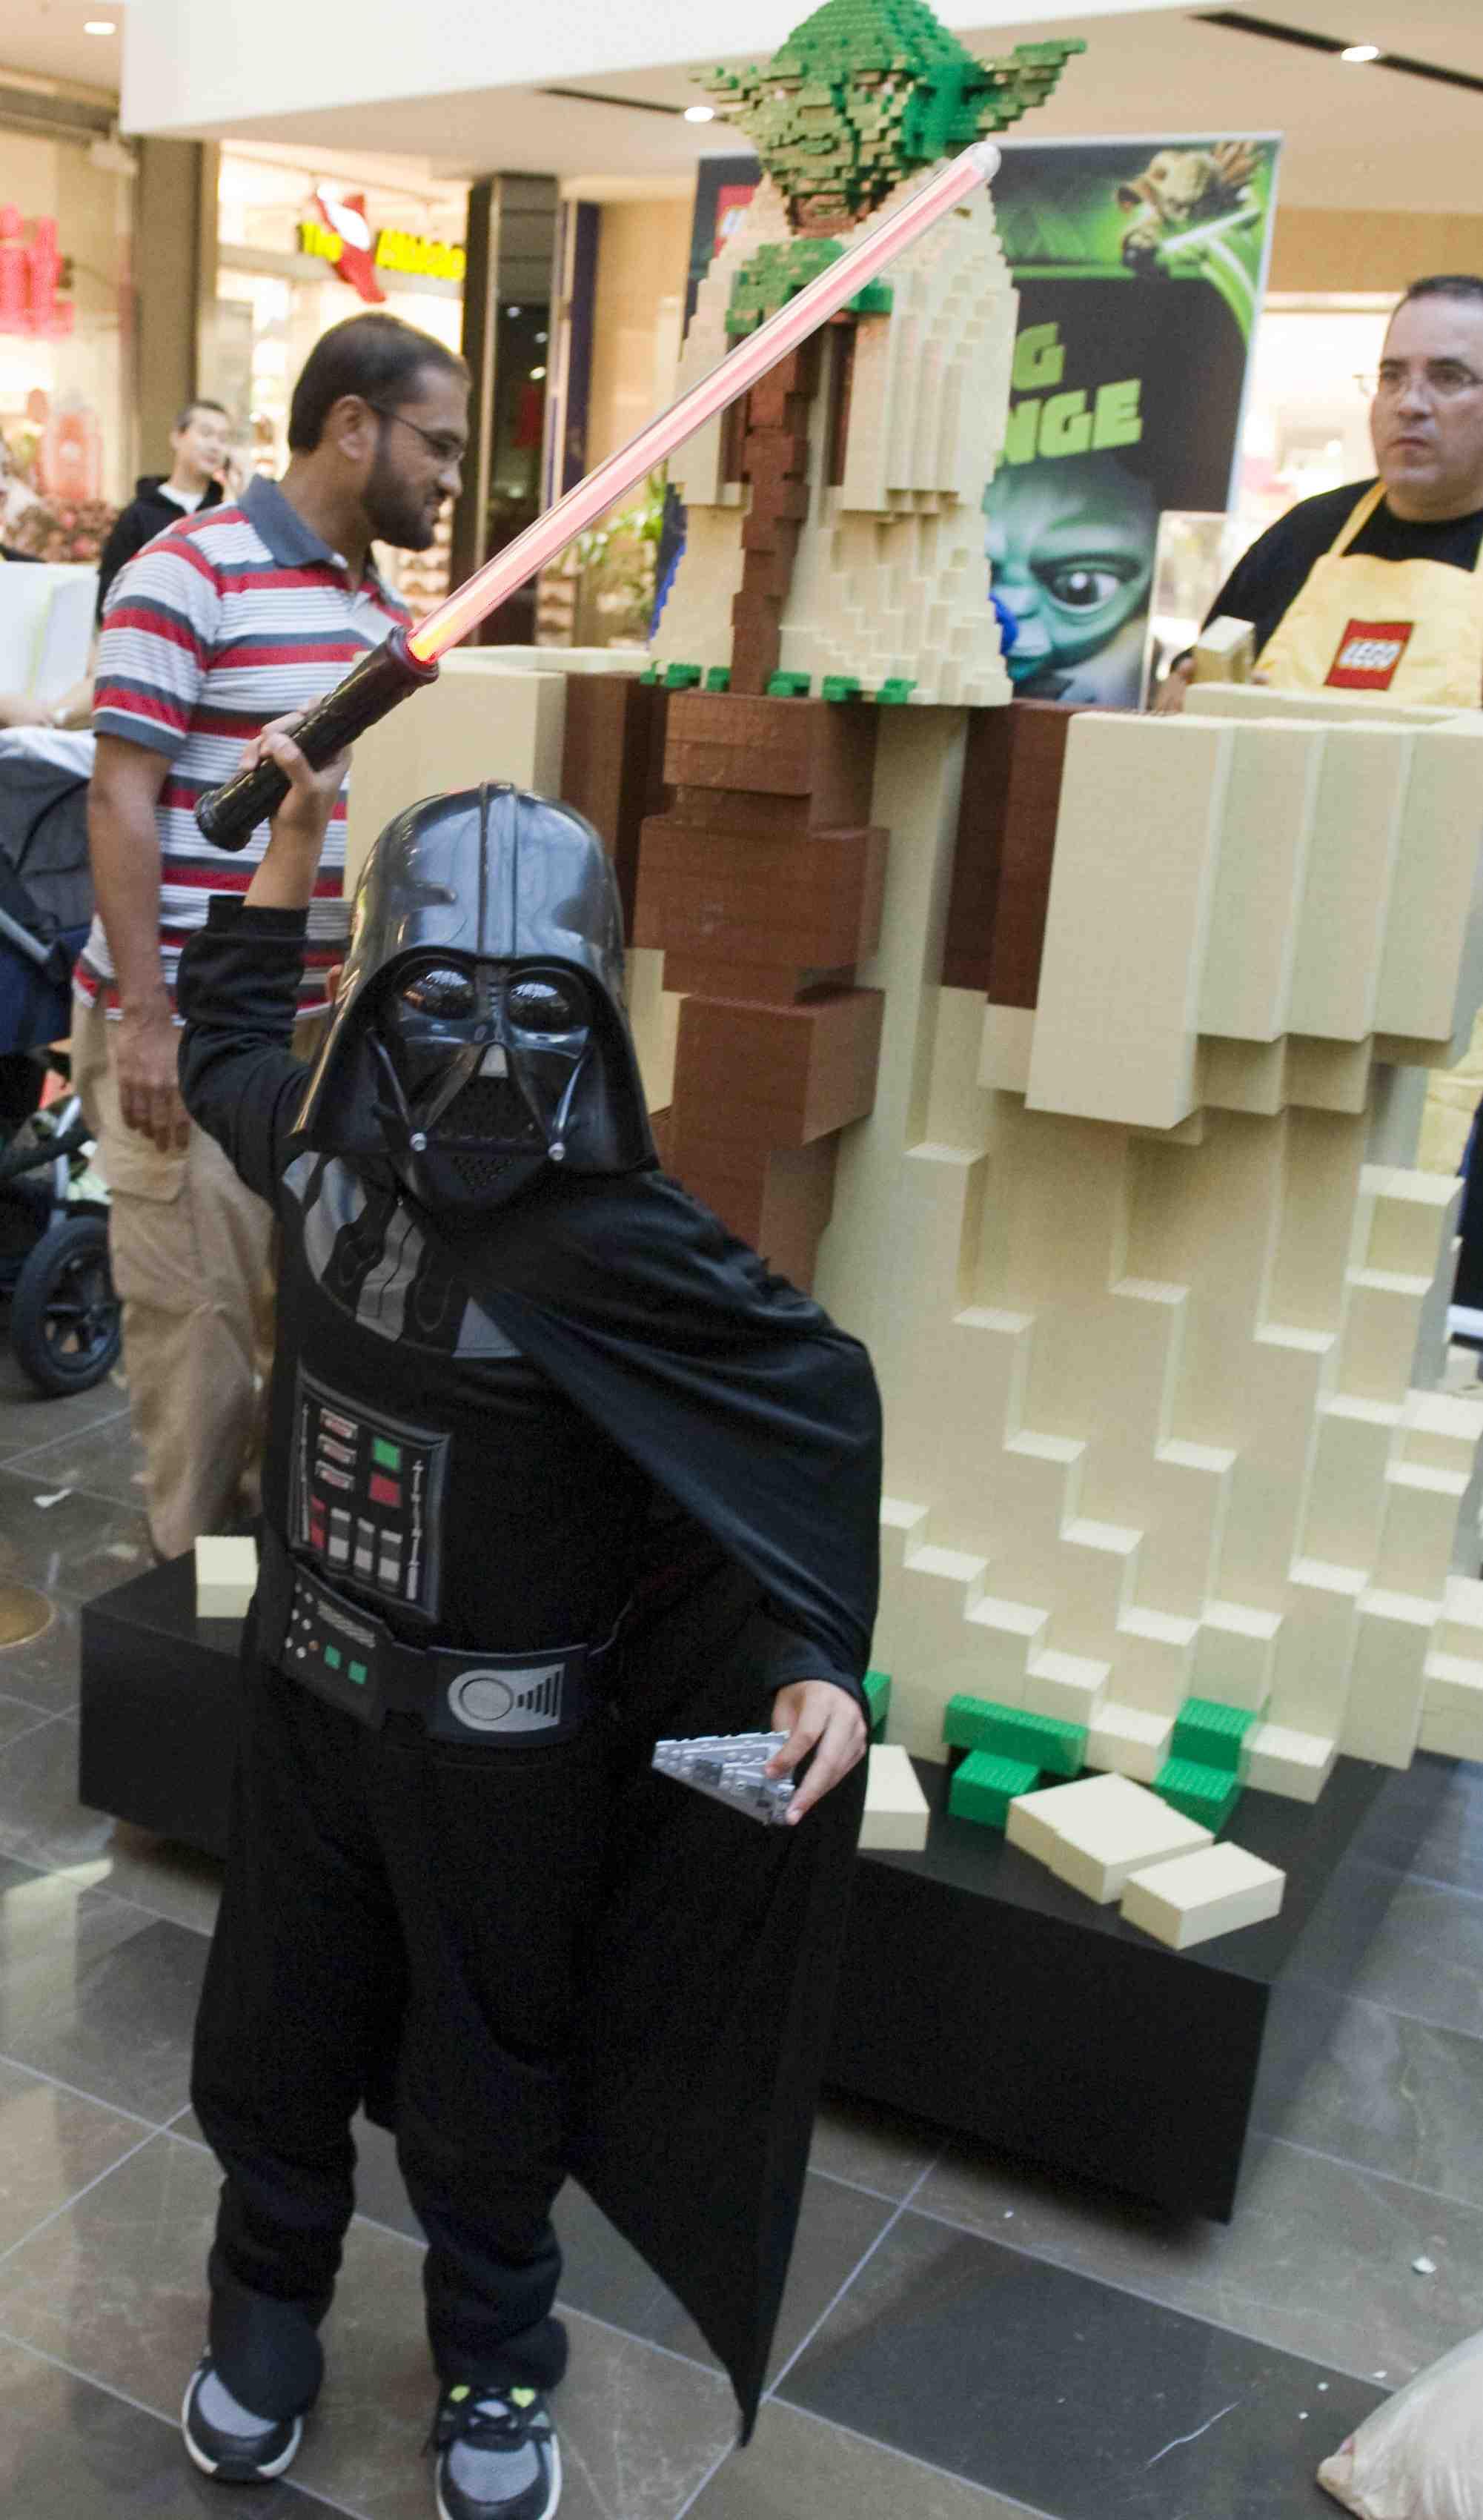 LEGO Star Wars May 4th Yoda Event